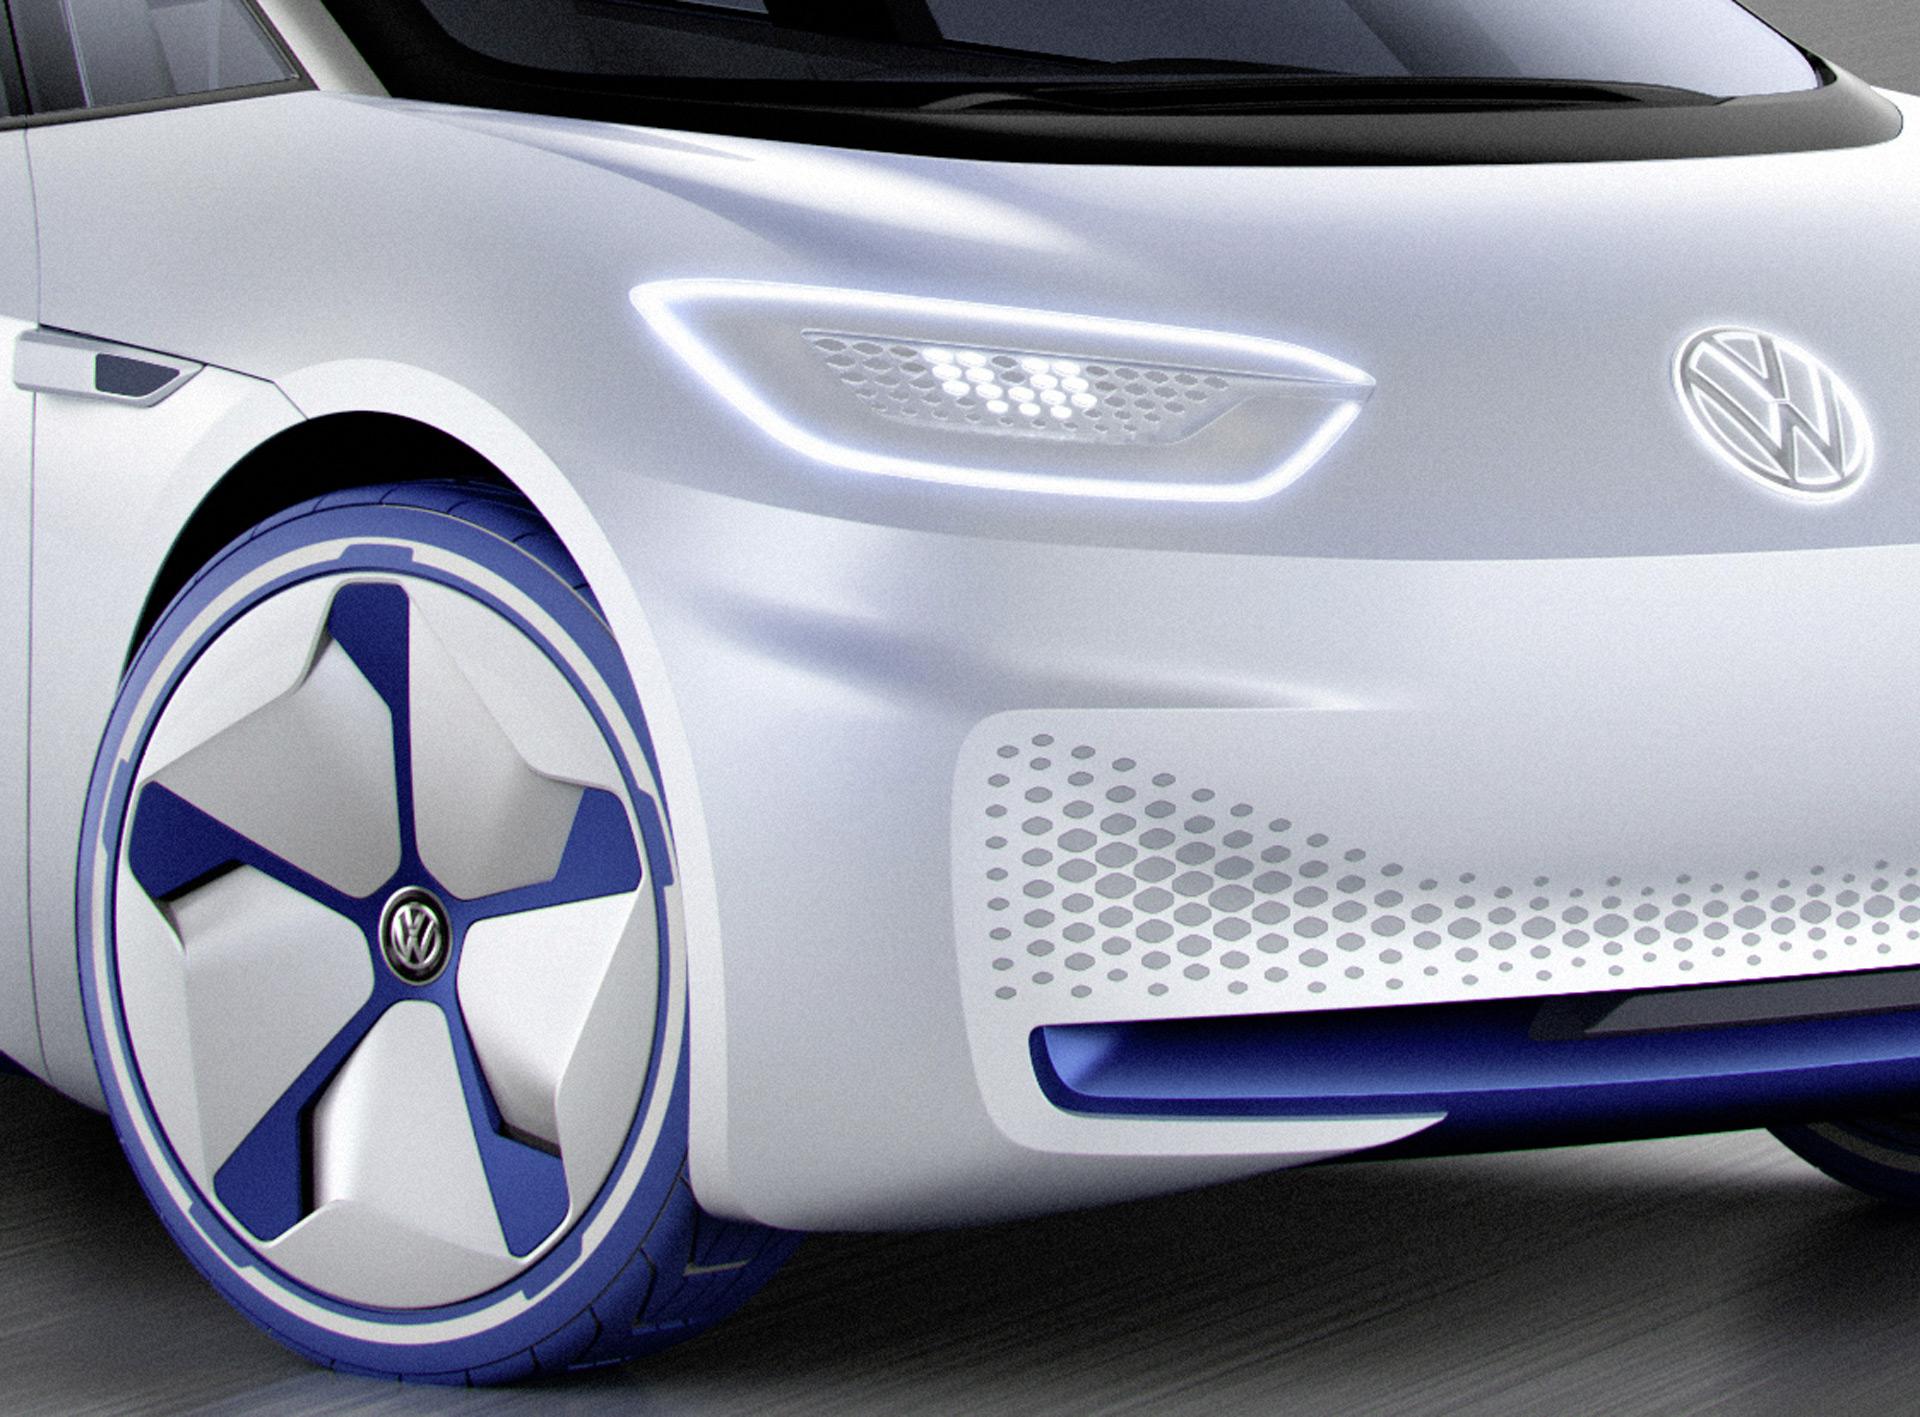 Vw Electric Car Concept Tesla Model S Race Car National